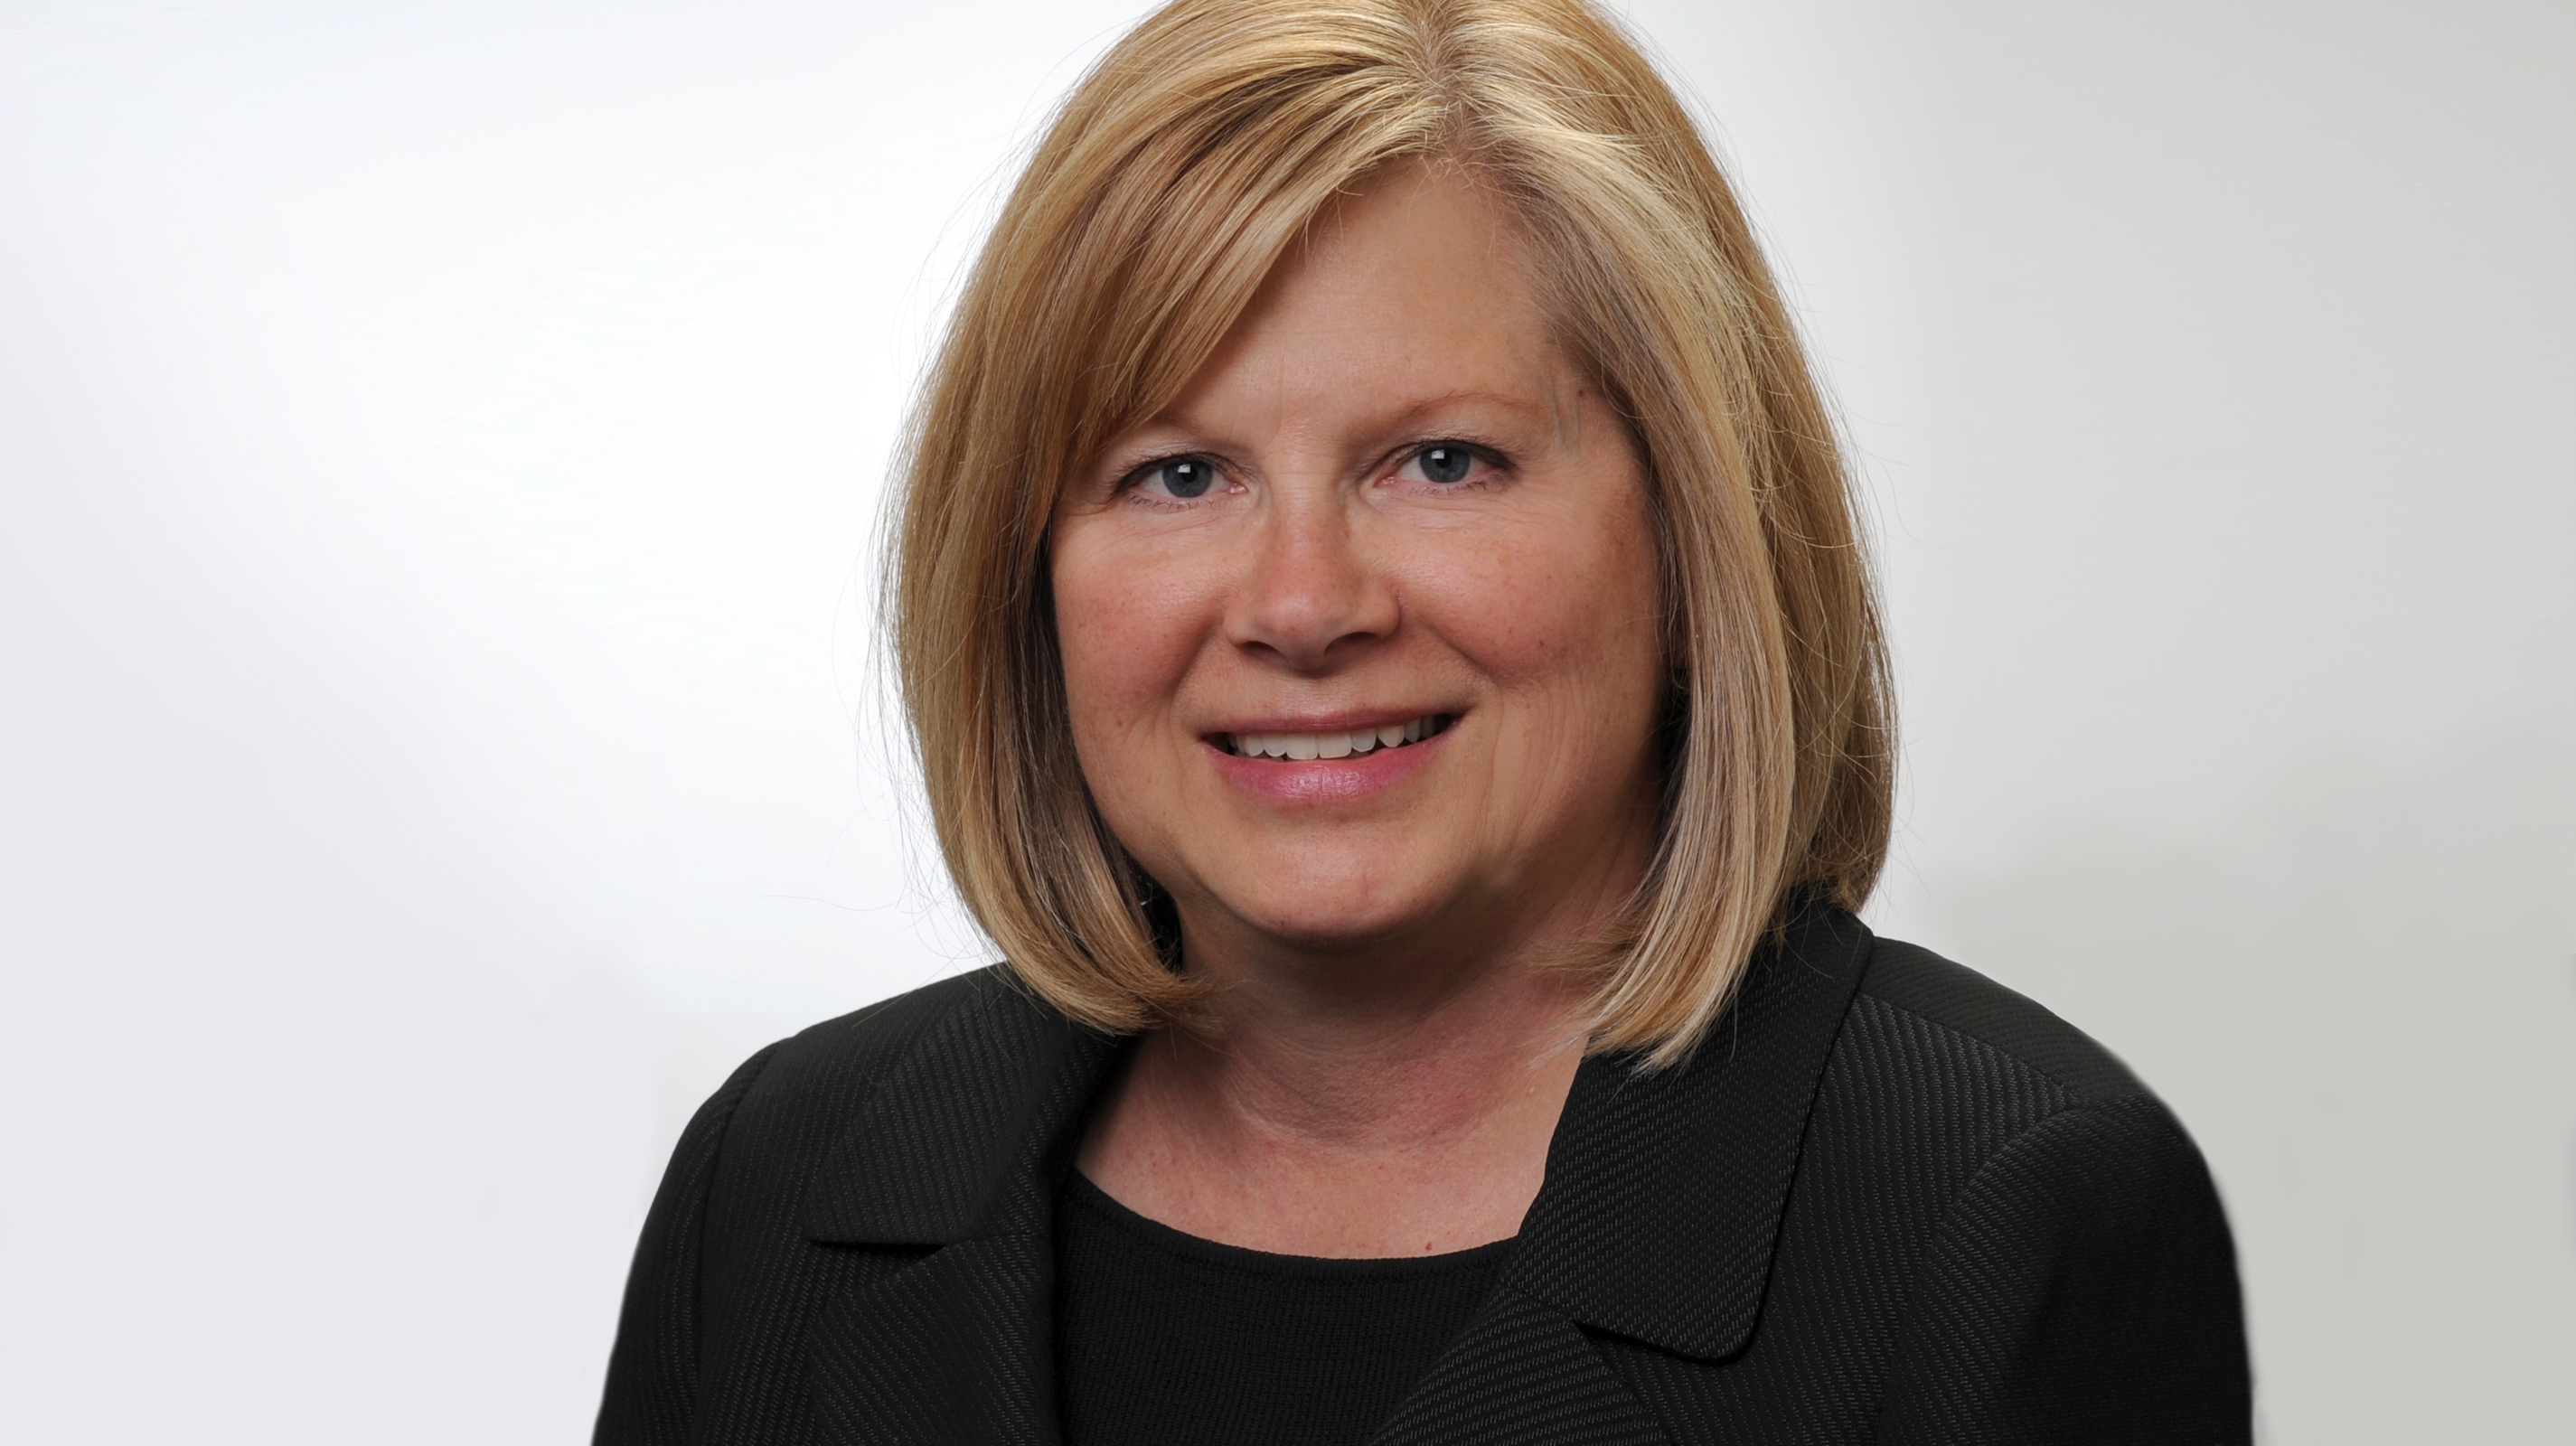 Linda Beckmeyer